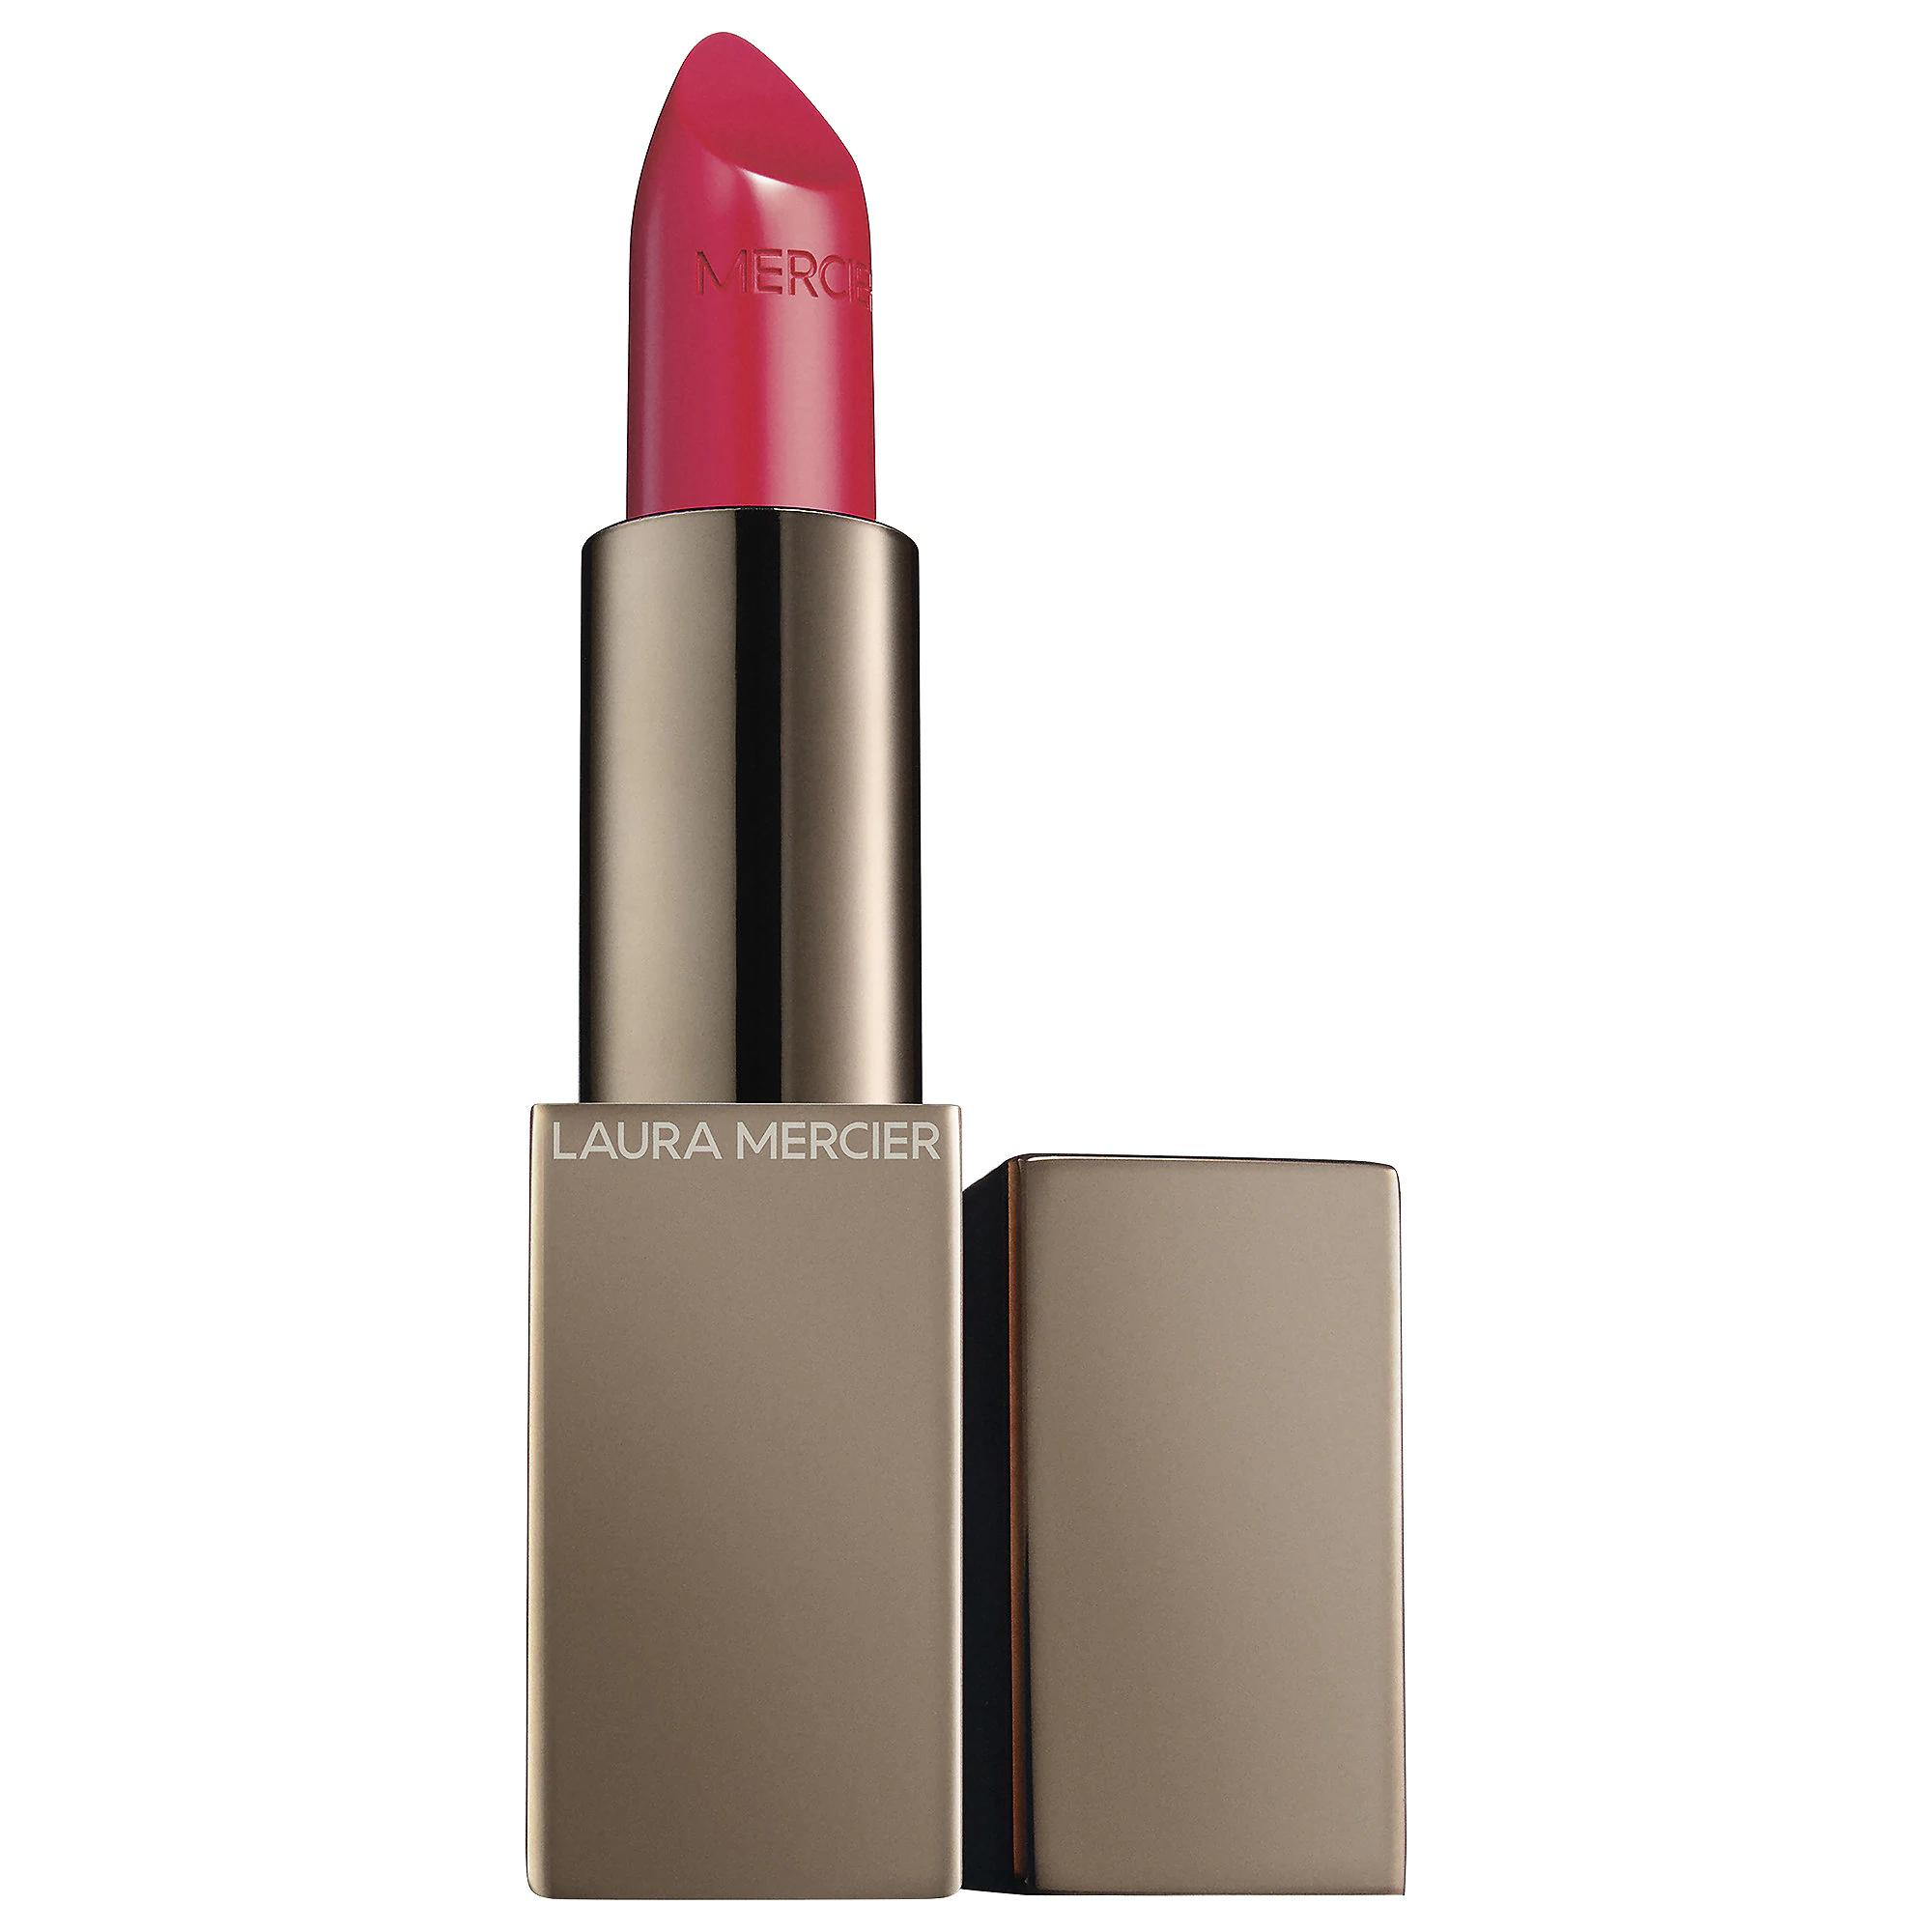 Laura Mercier Rouge Essentiel Silky Creme Lipstick Fuchsia Intense